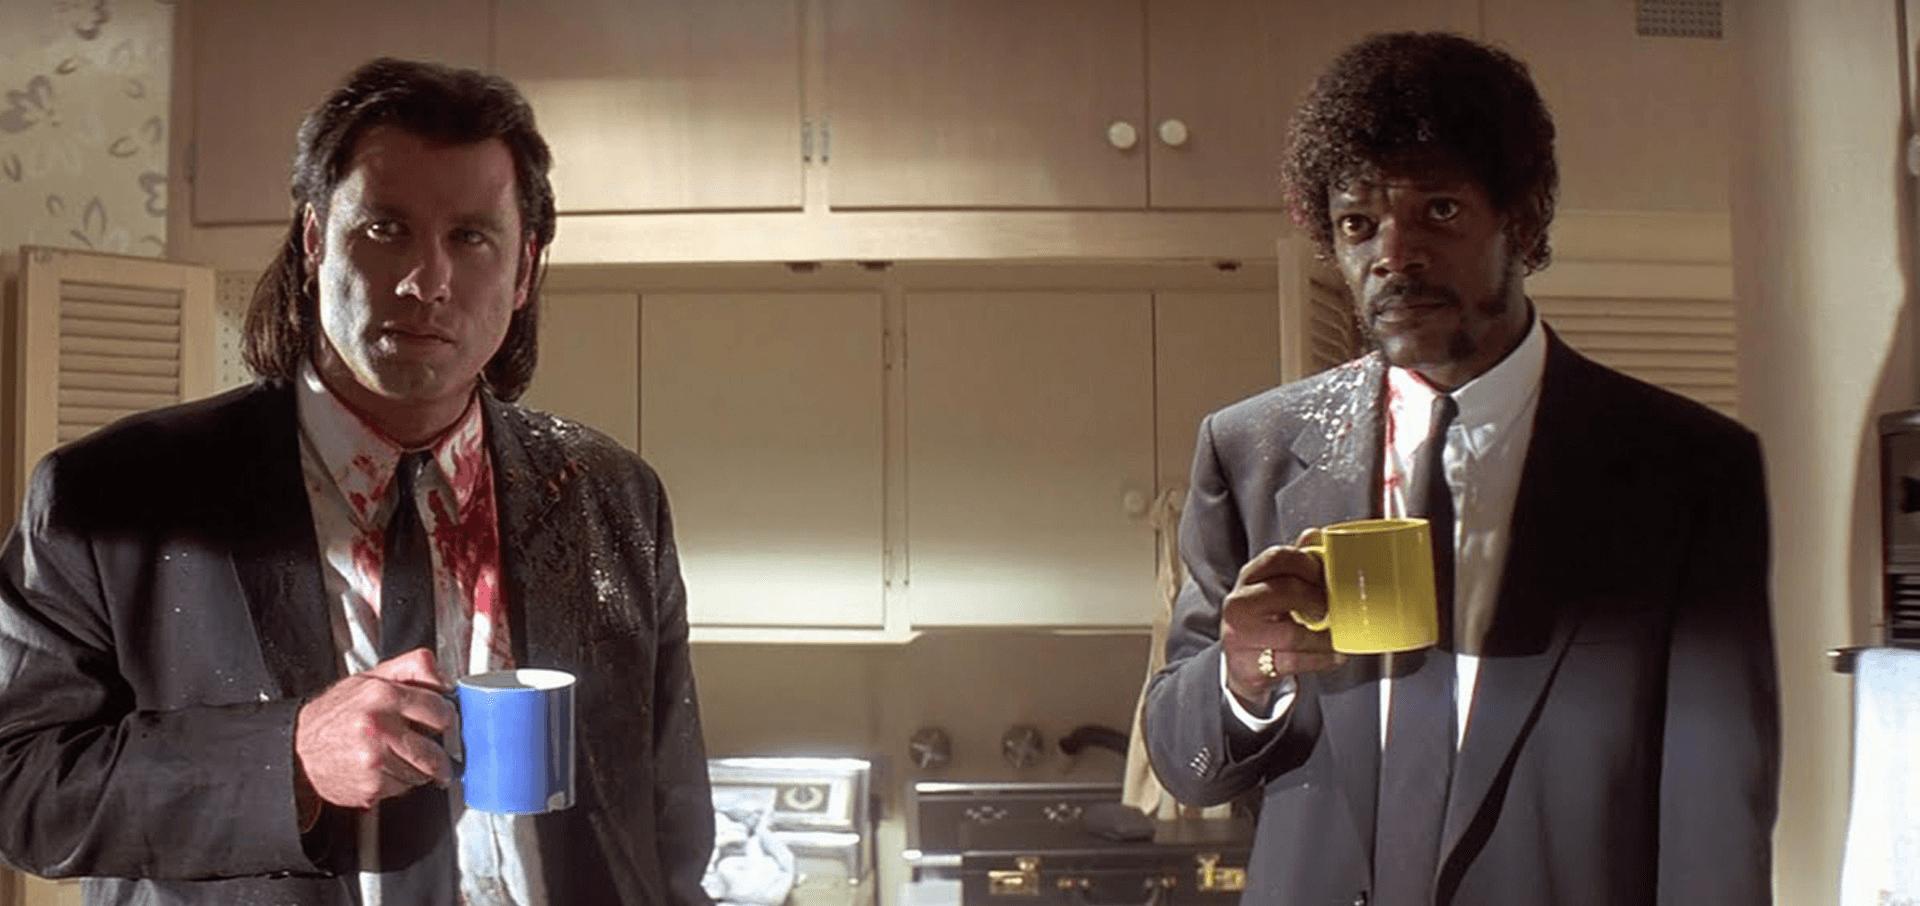 Pulp Fiction (1994) by Quentin Tarantino